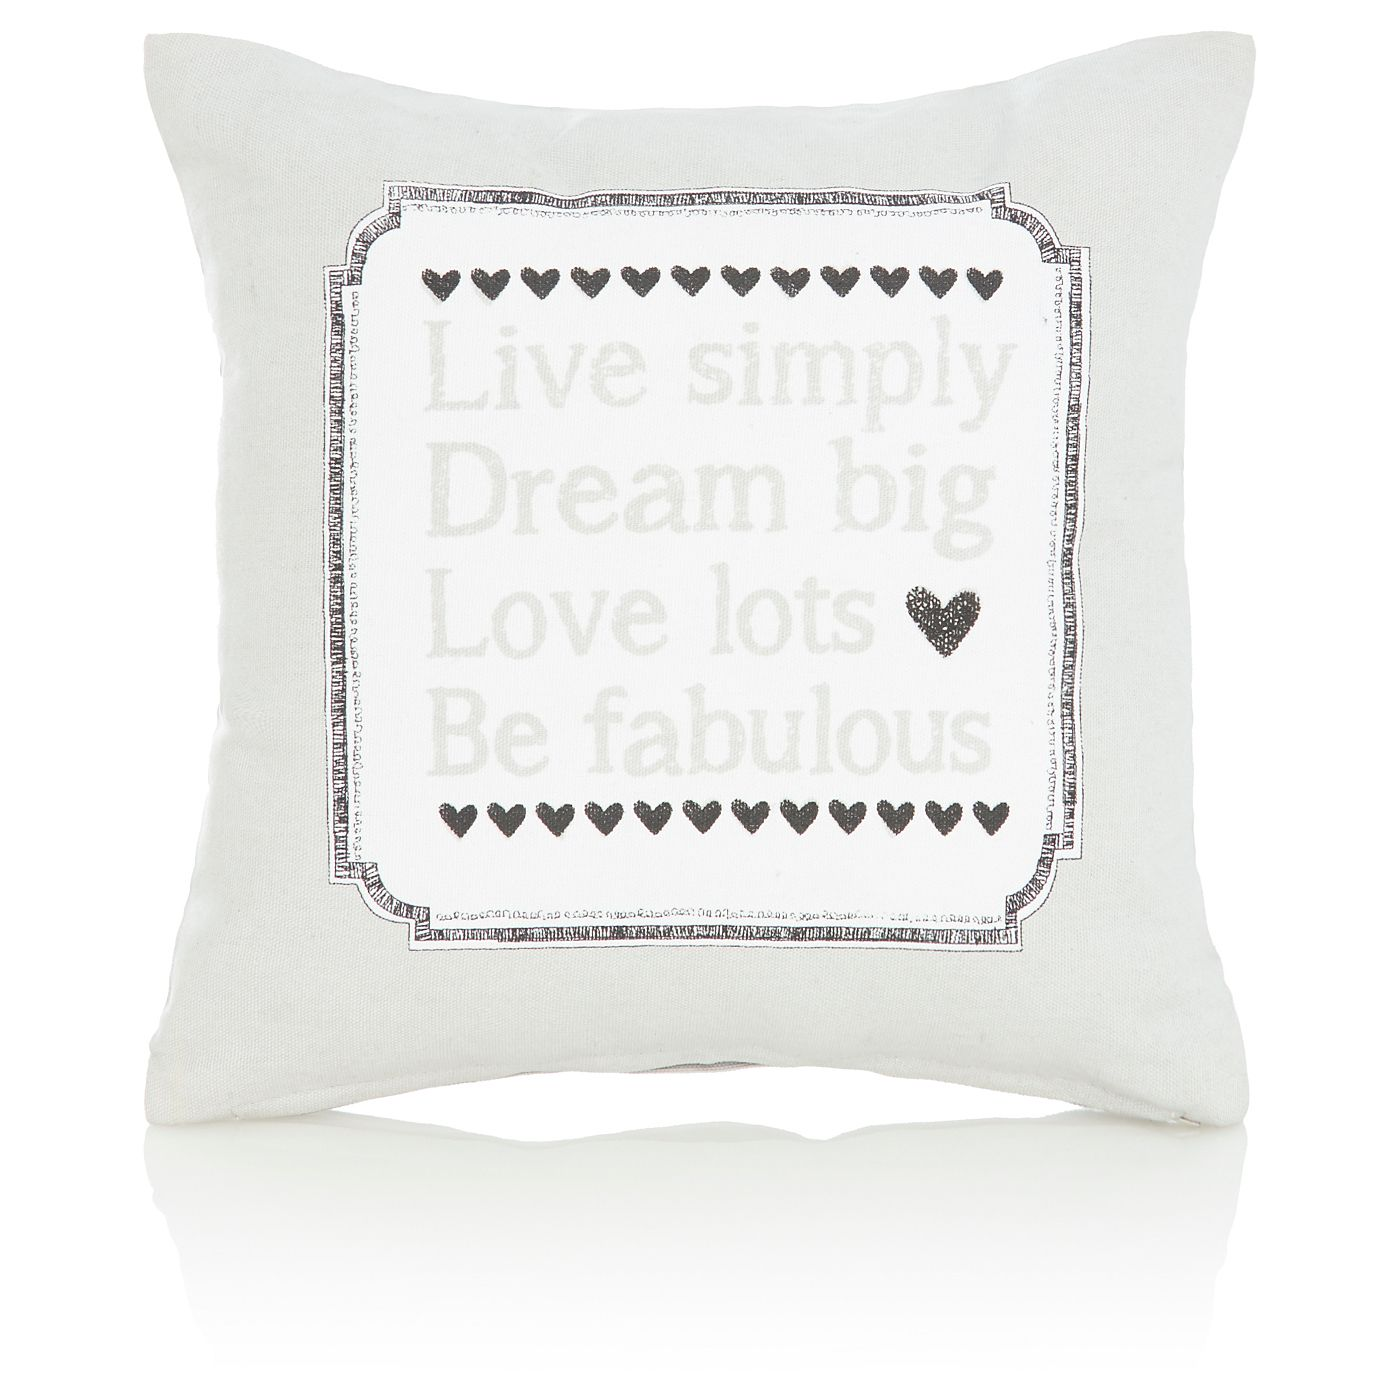 George Home Fabulous Cushion Cushions Beanbags Throws Asda Direct George Home Cushions Asda